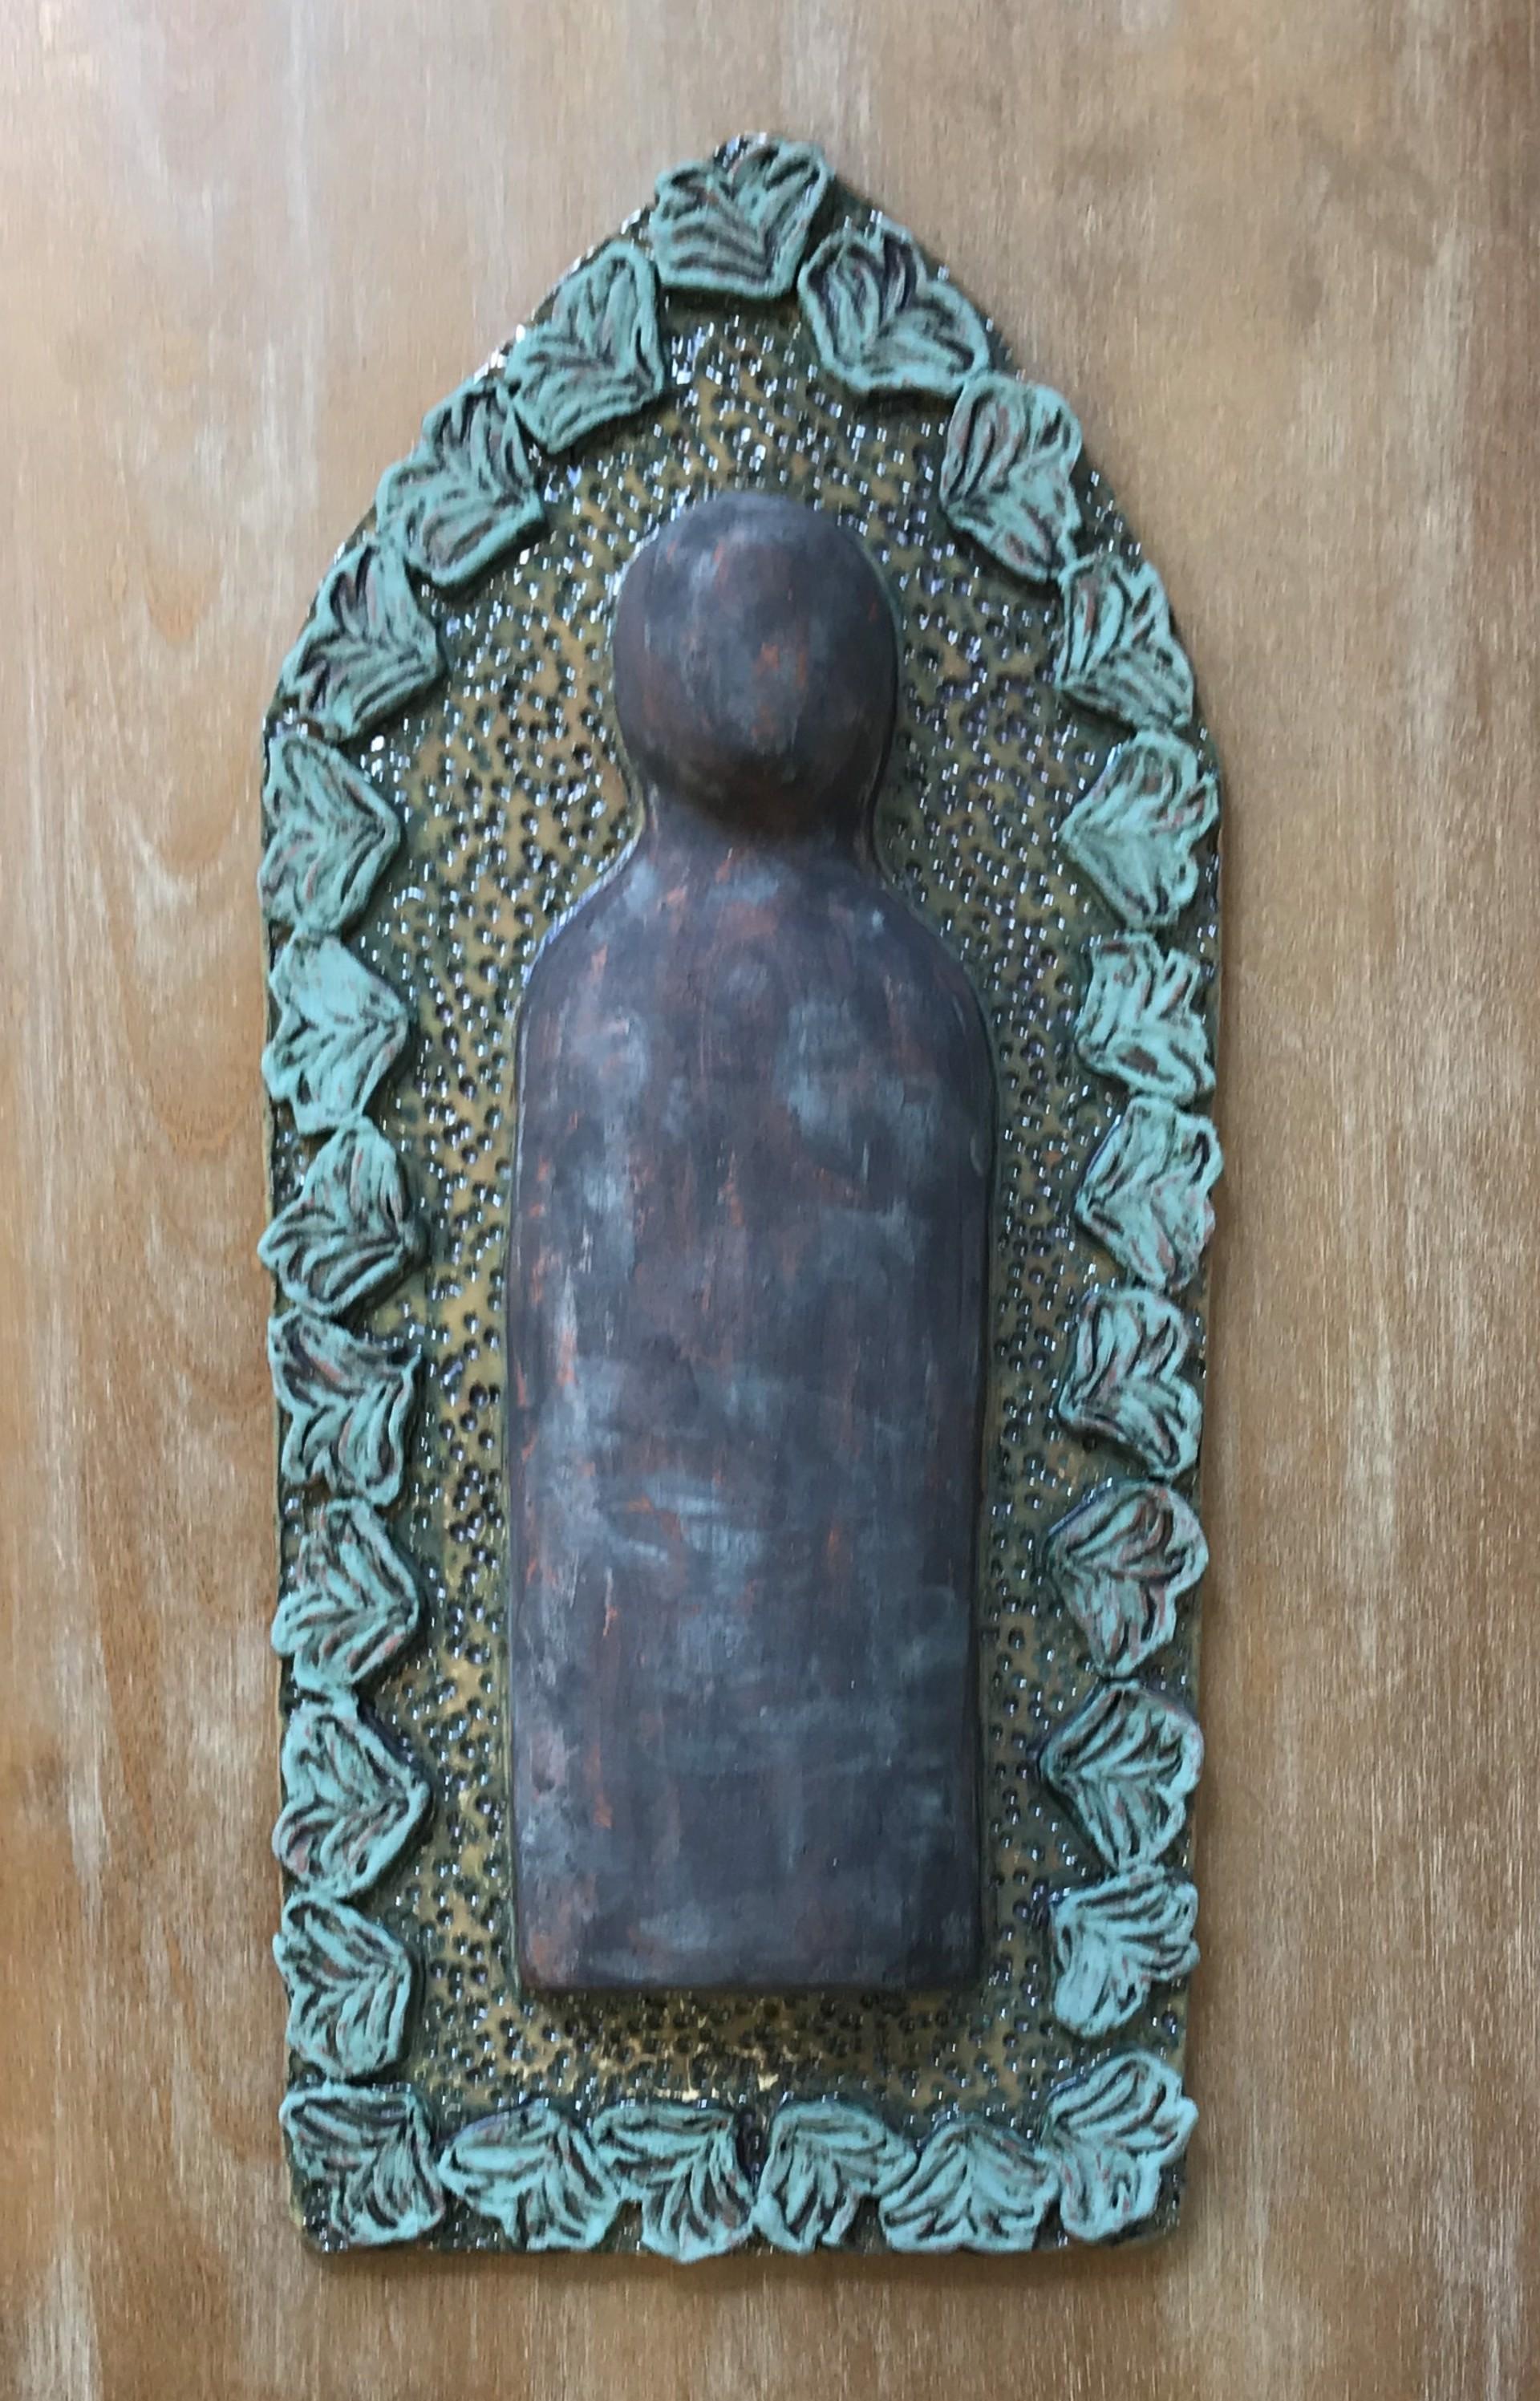 Medium Ceramic Reliquary by Cassie Butcher